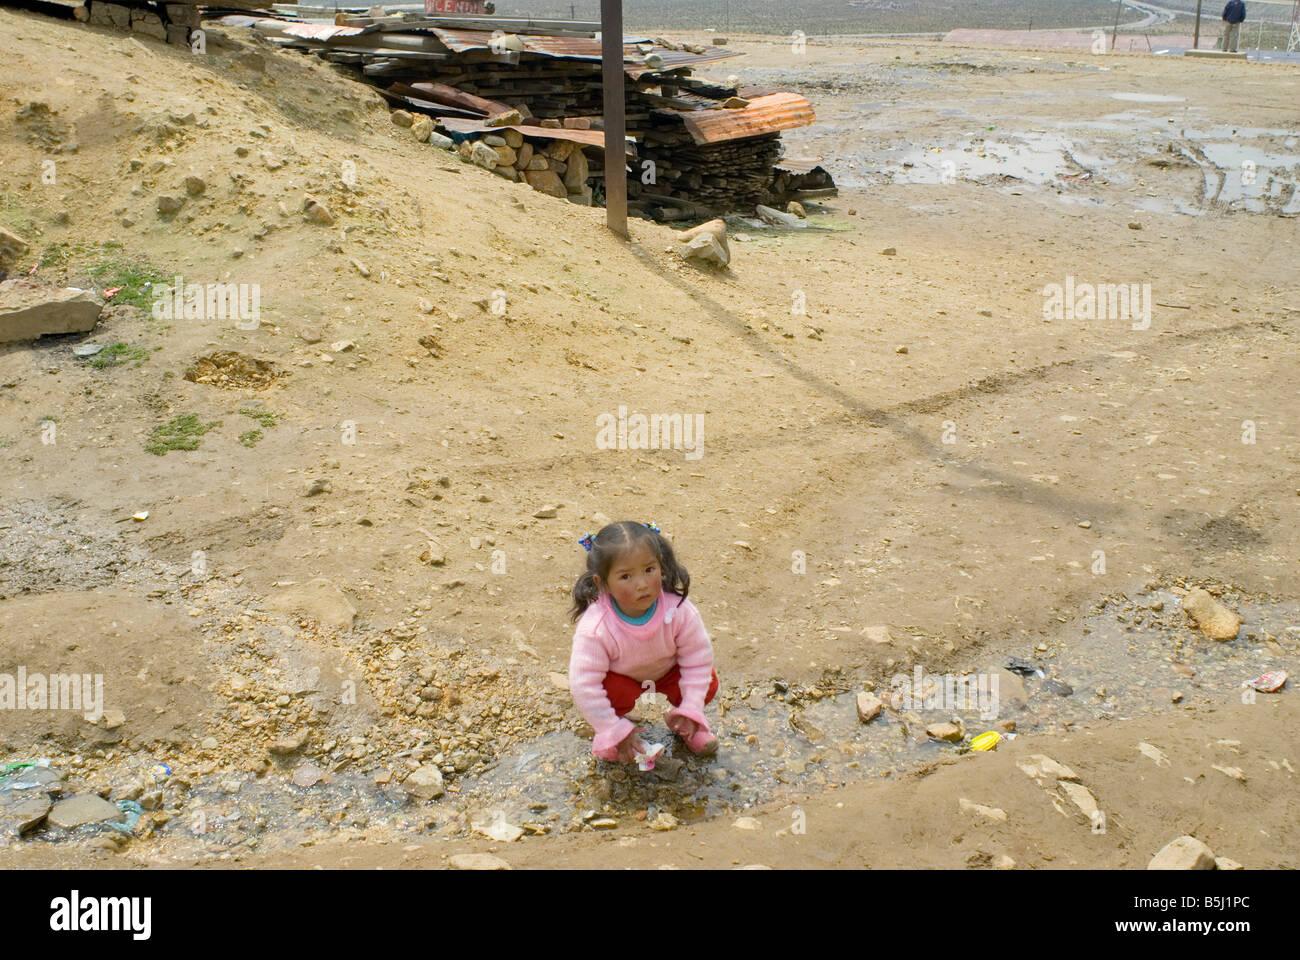 Scene in the small mining town of Morococho Peru - Stock Image